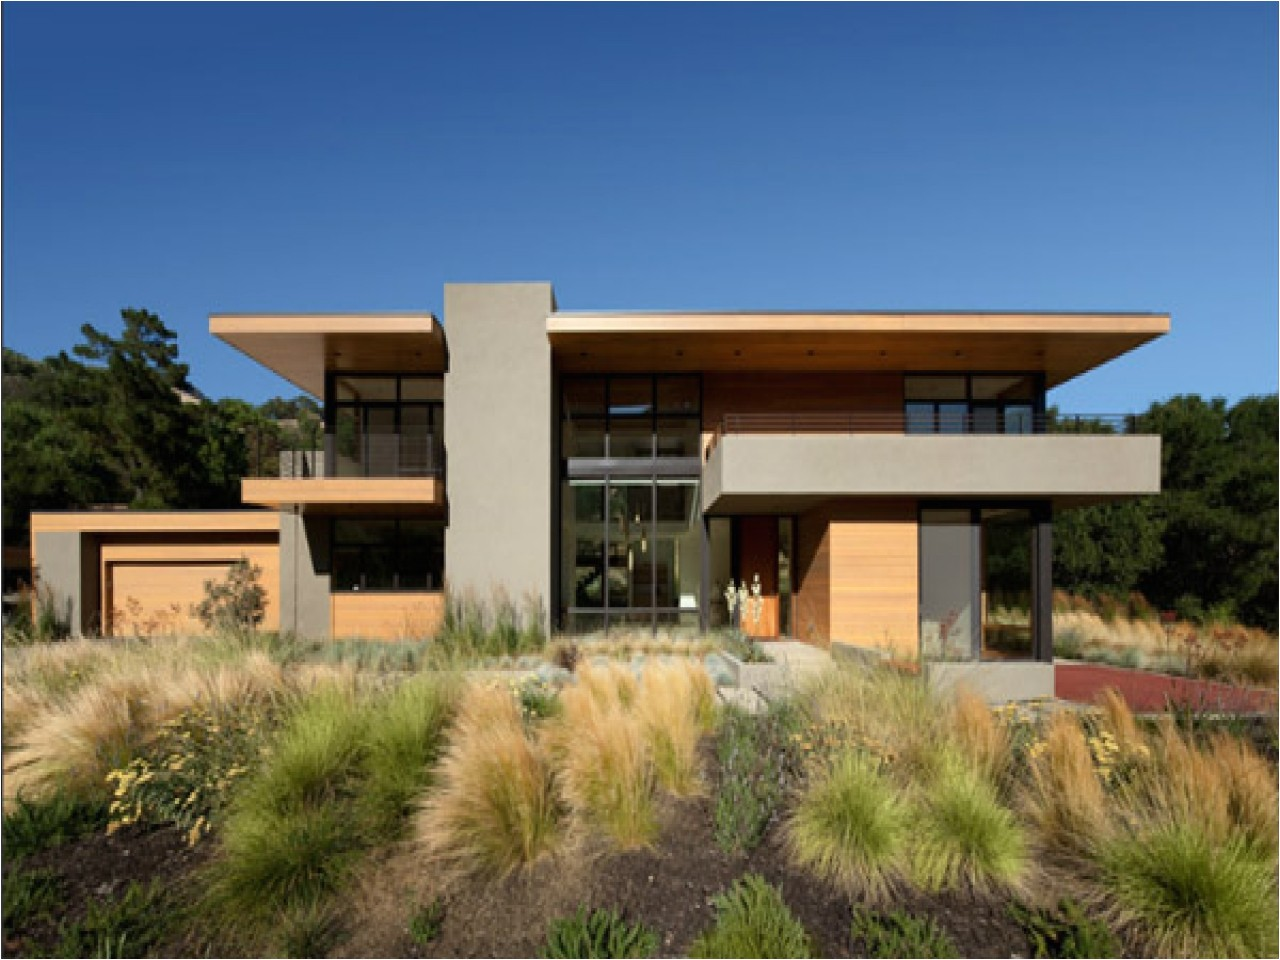 california modern home plans that klas holm